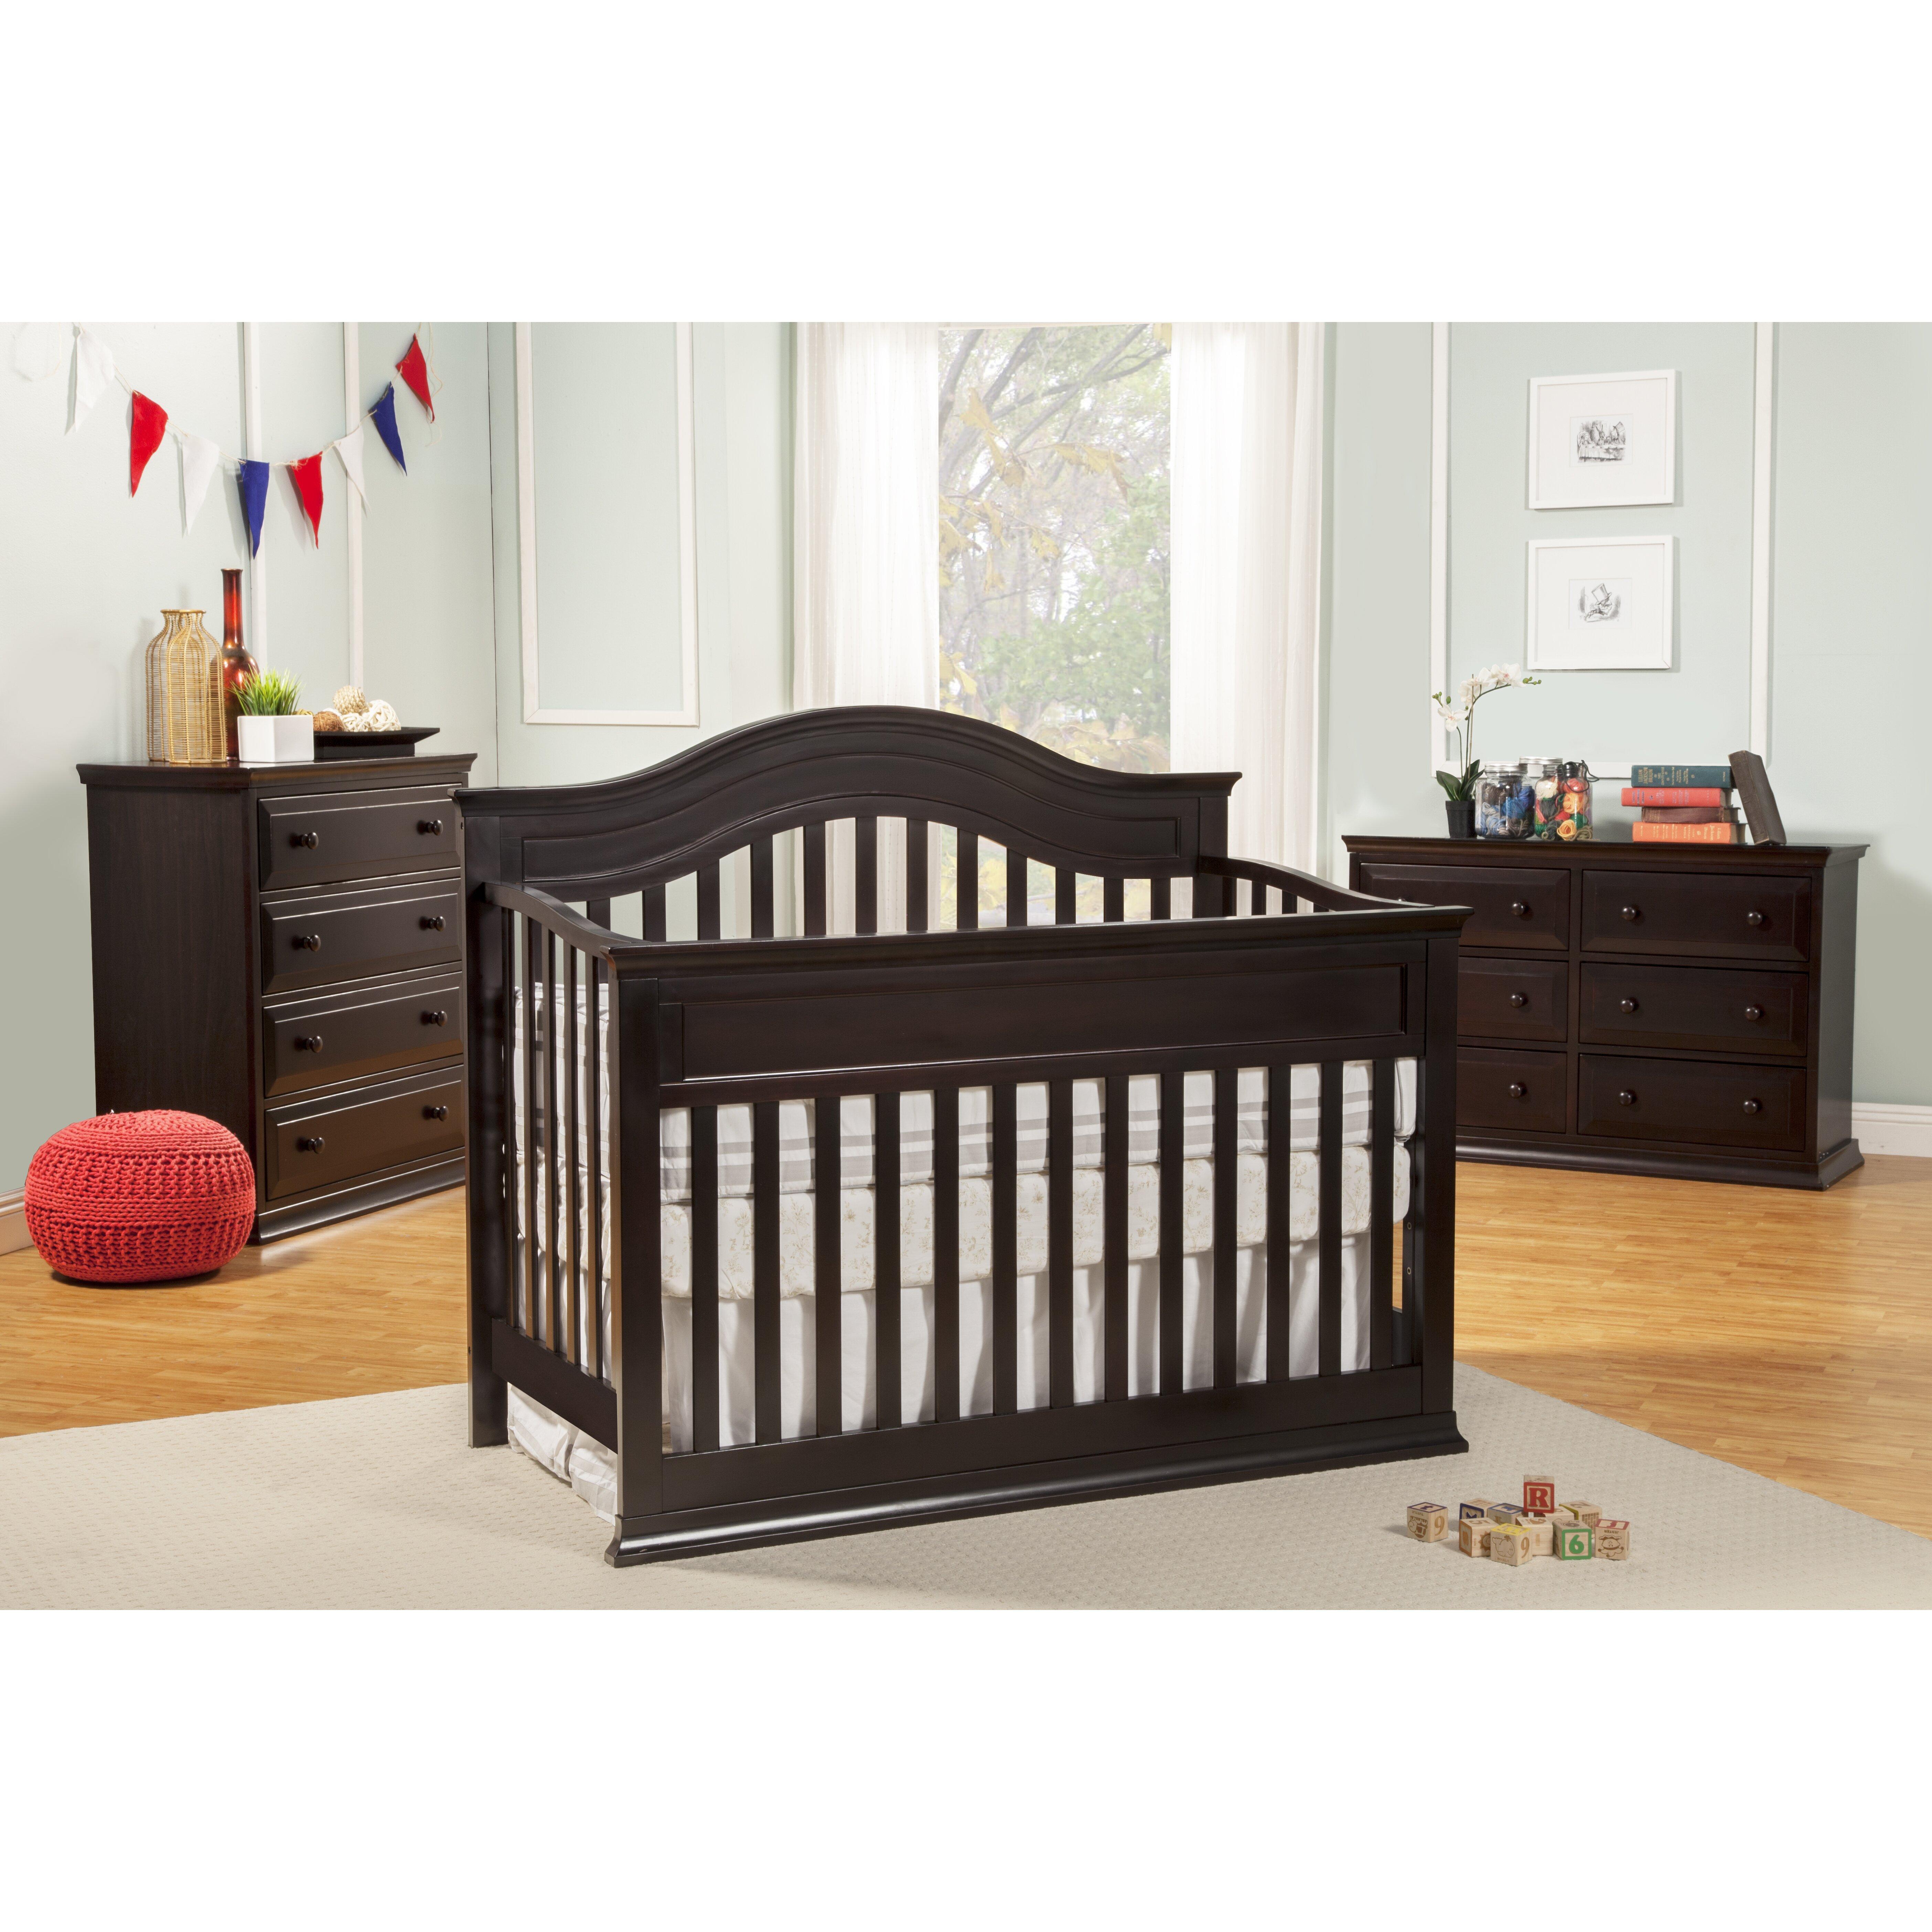 DaVinci Brook 4-in-1 Convertible Crib & Reviews